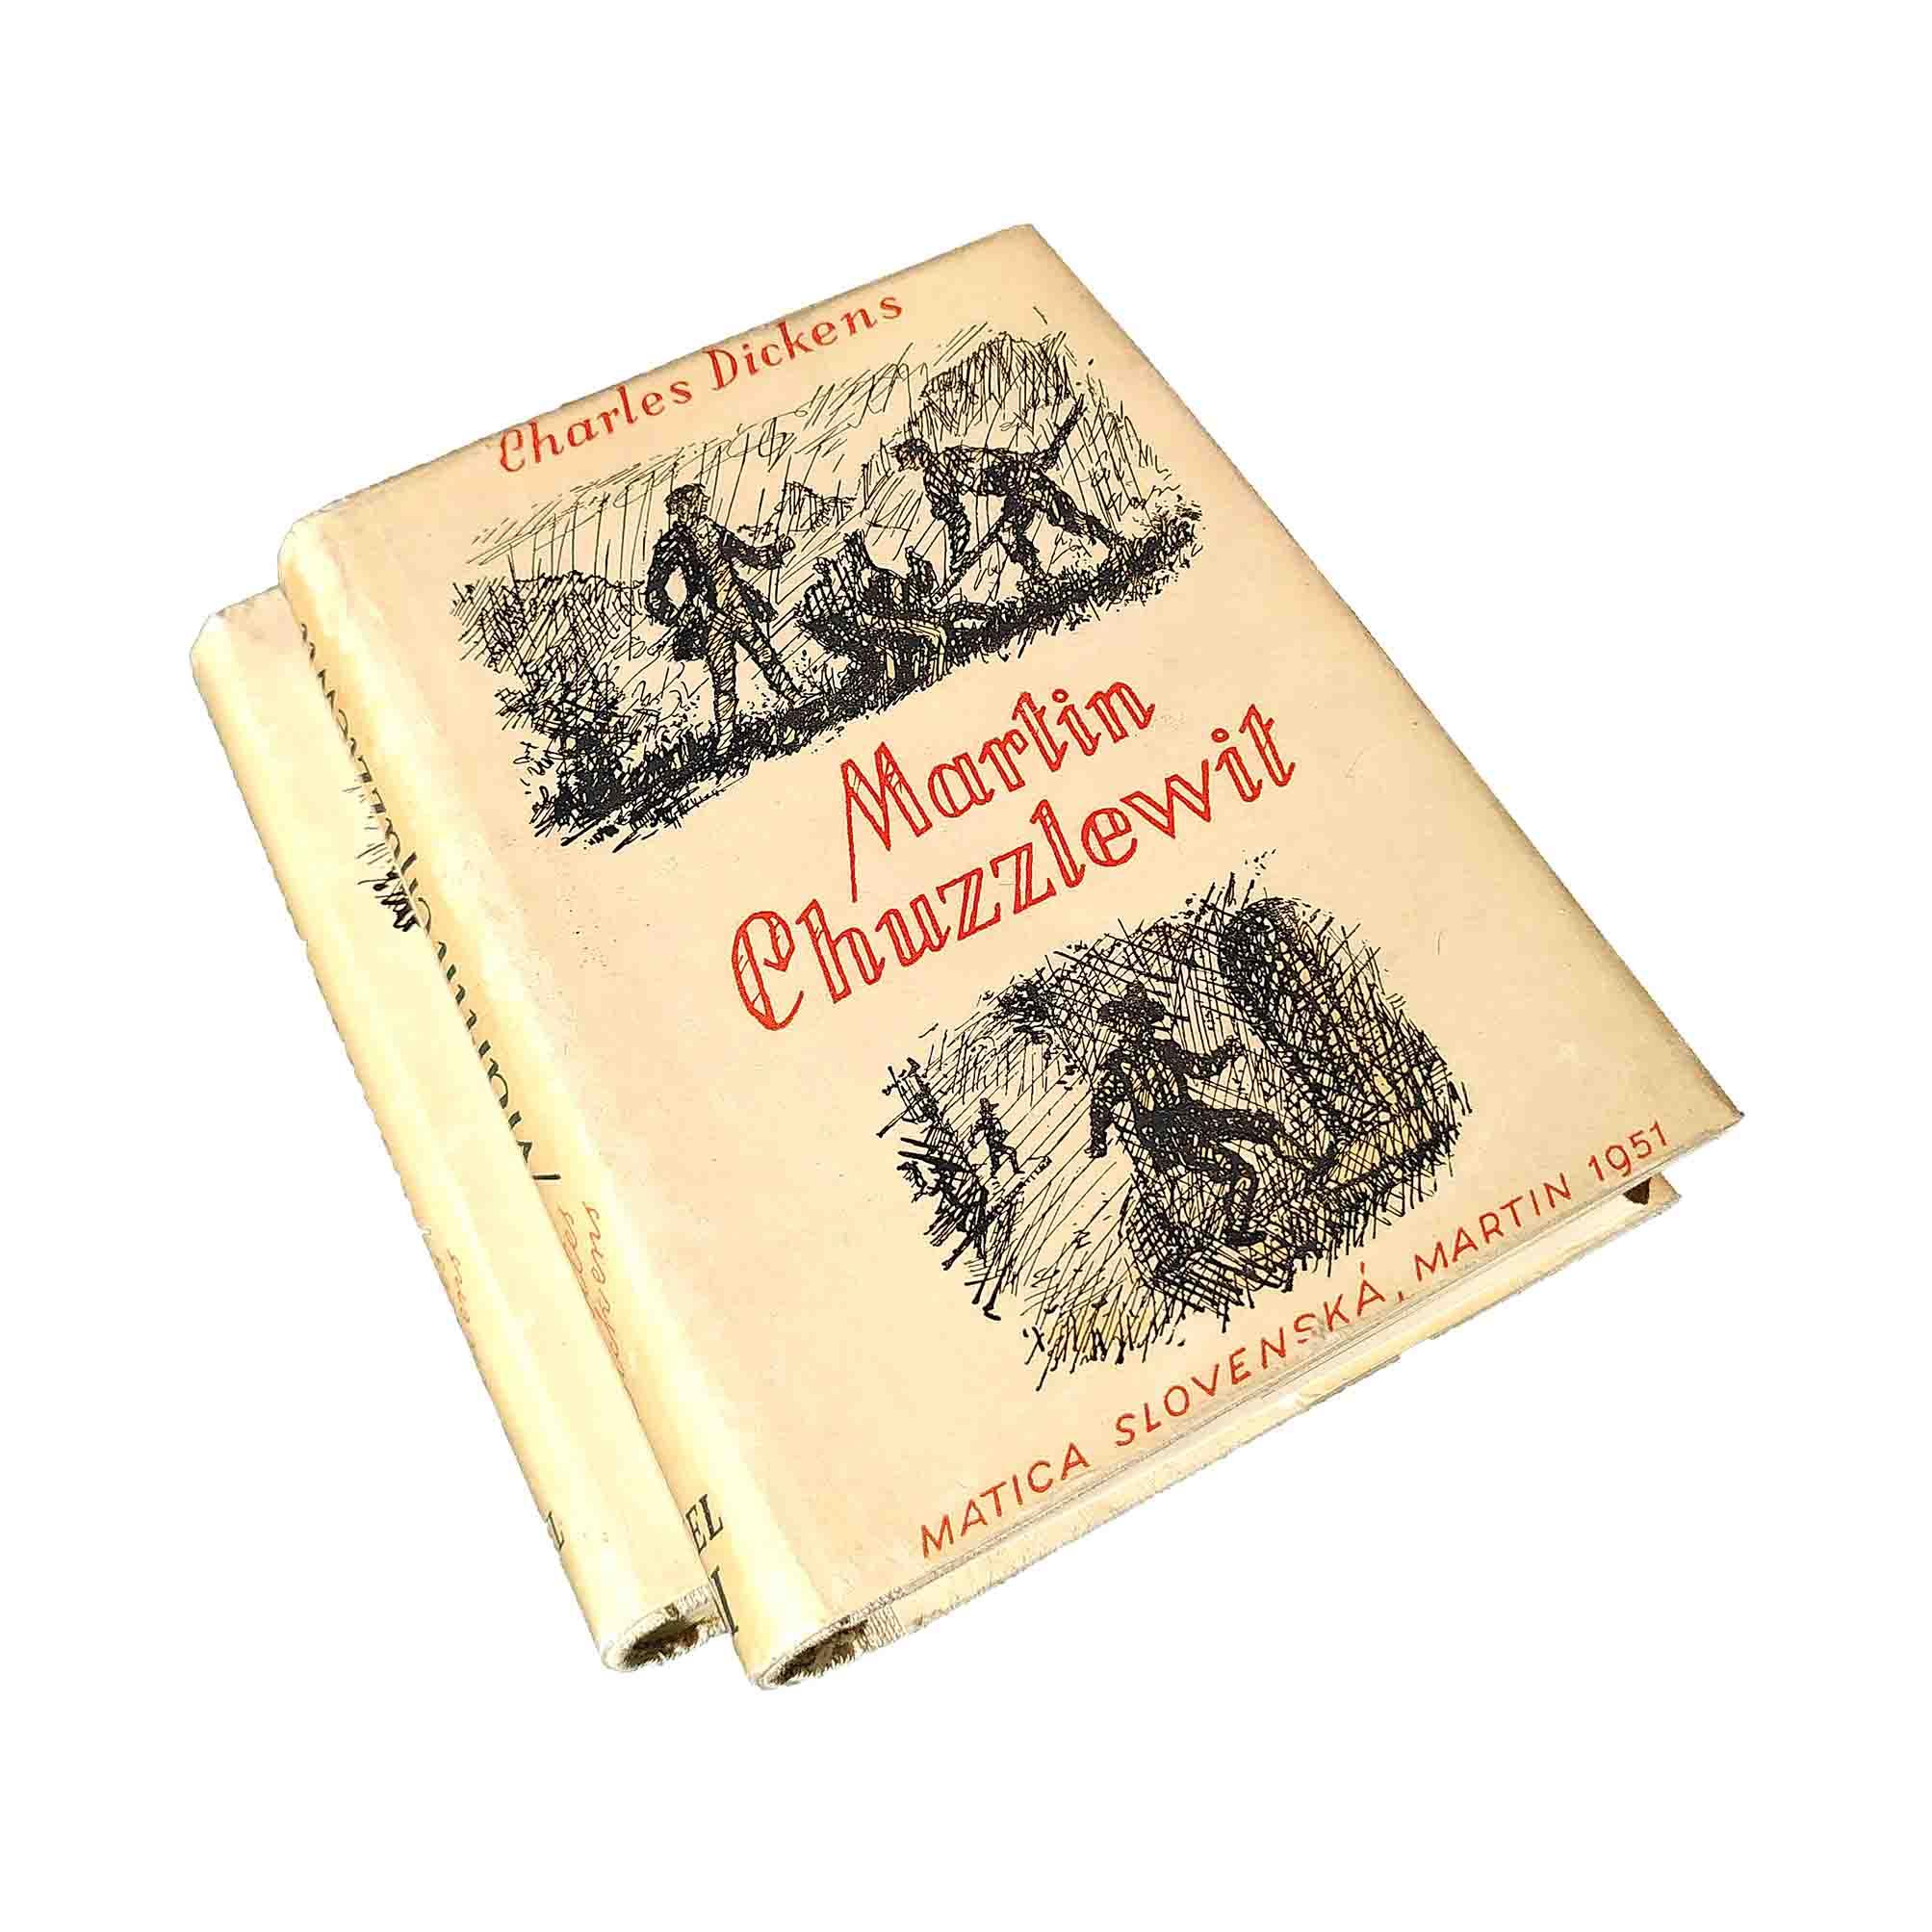 5917-Dickens-Chuzzlewit-Slovak-First-Edition-1951-Dust-Jackets-free-N.jpg